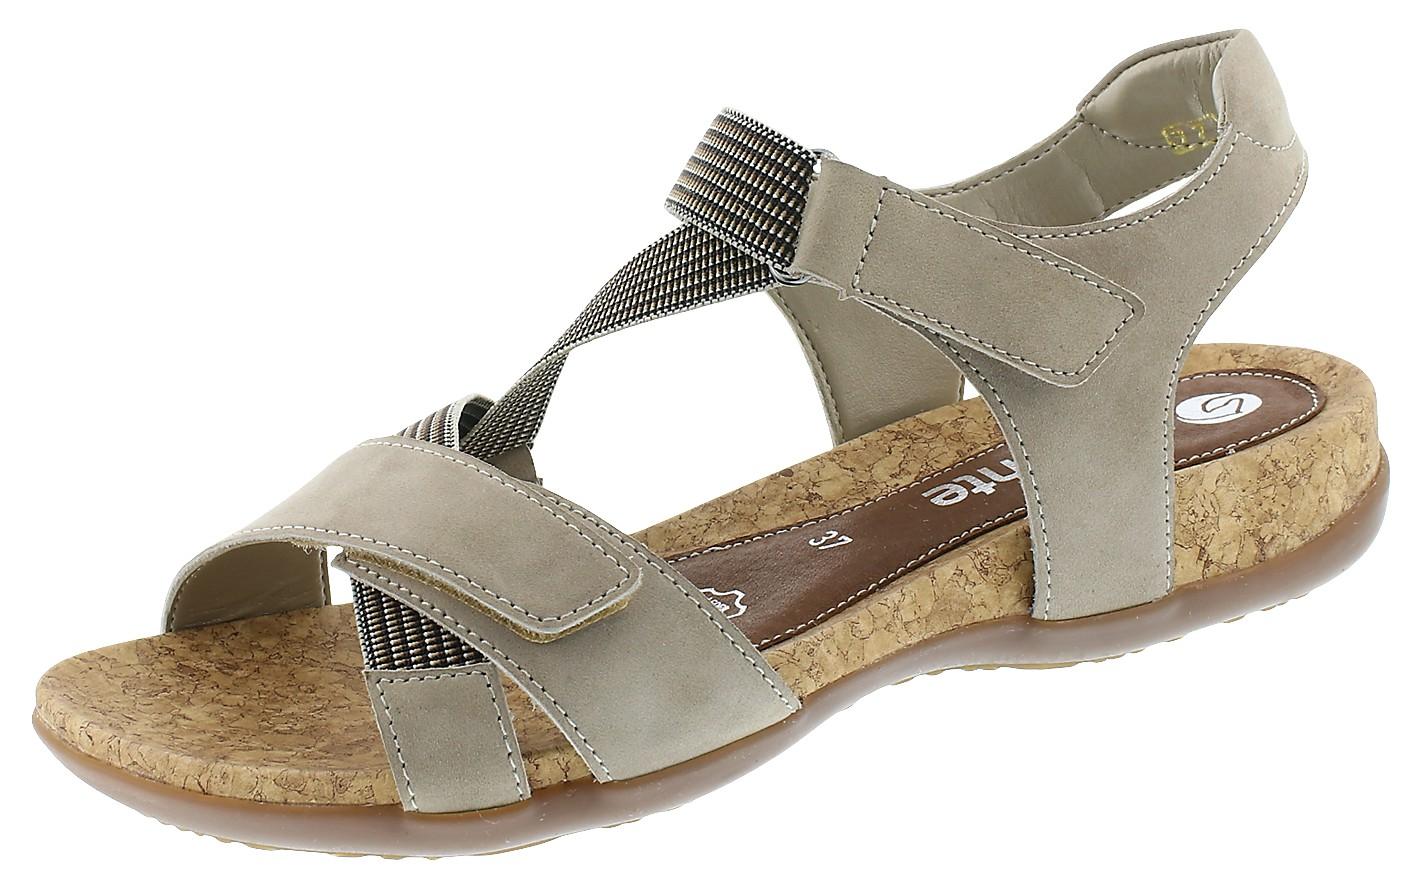 Remonte Damen Sandale-Pantolette D.Sandaleette Grau R3257 42 STEEL/